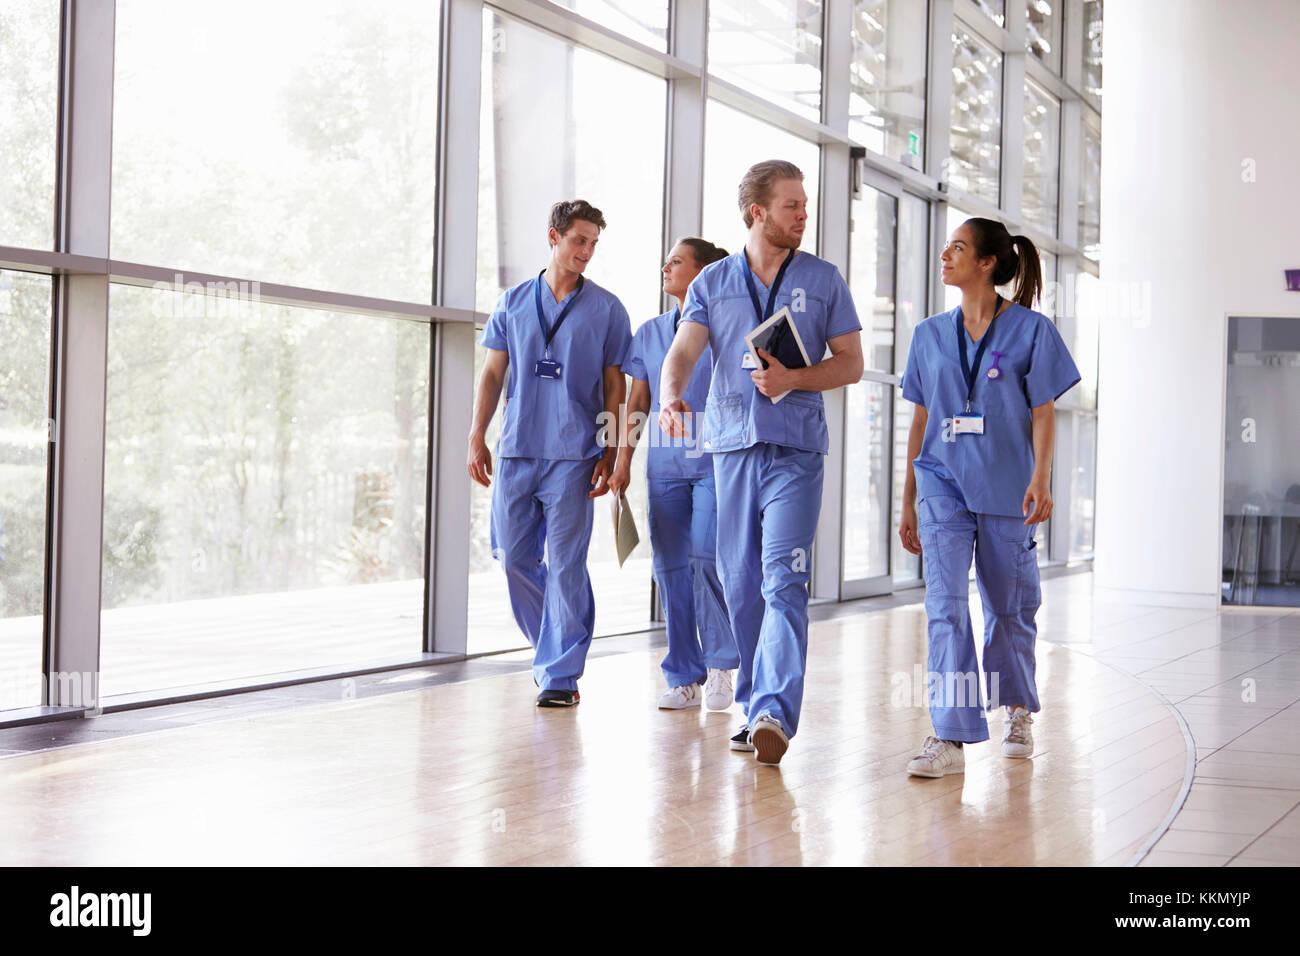 Four healthcare workers in scrubs walking in corridor - Stock Image